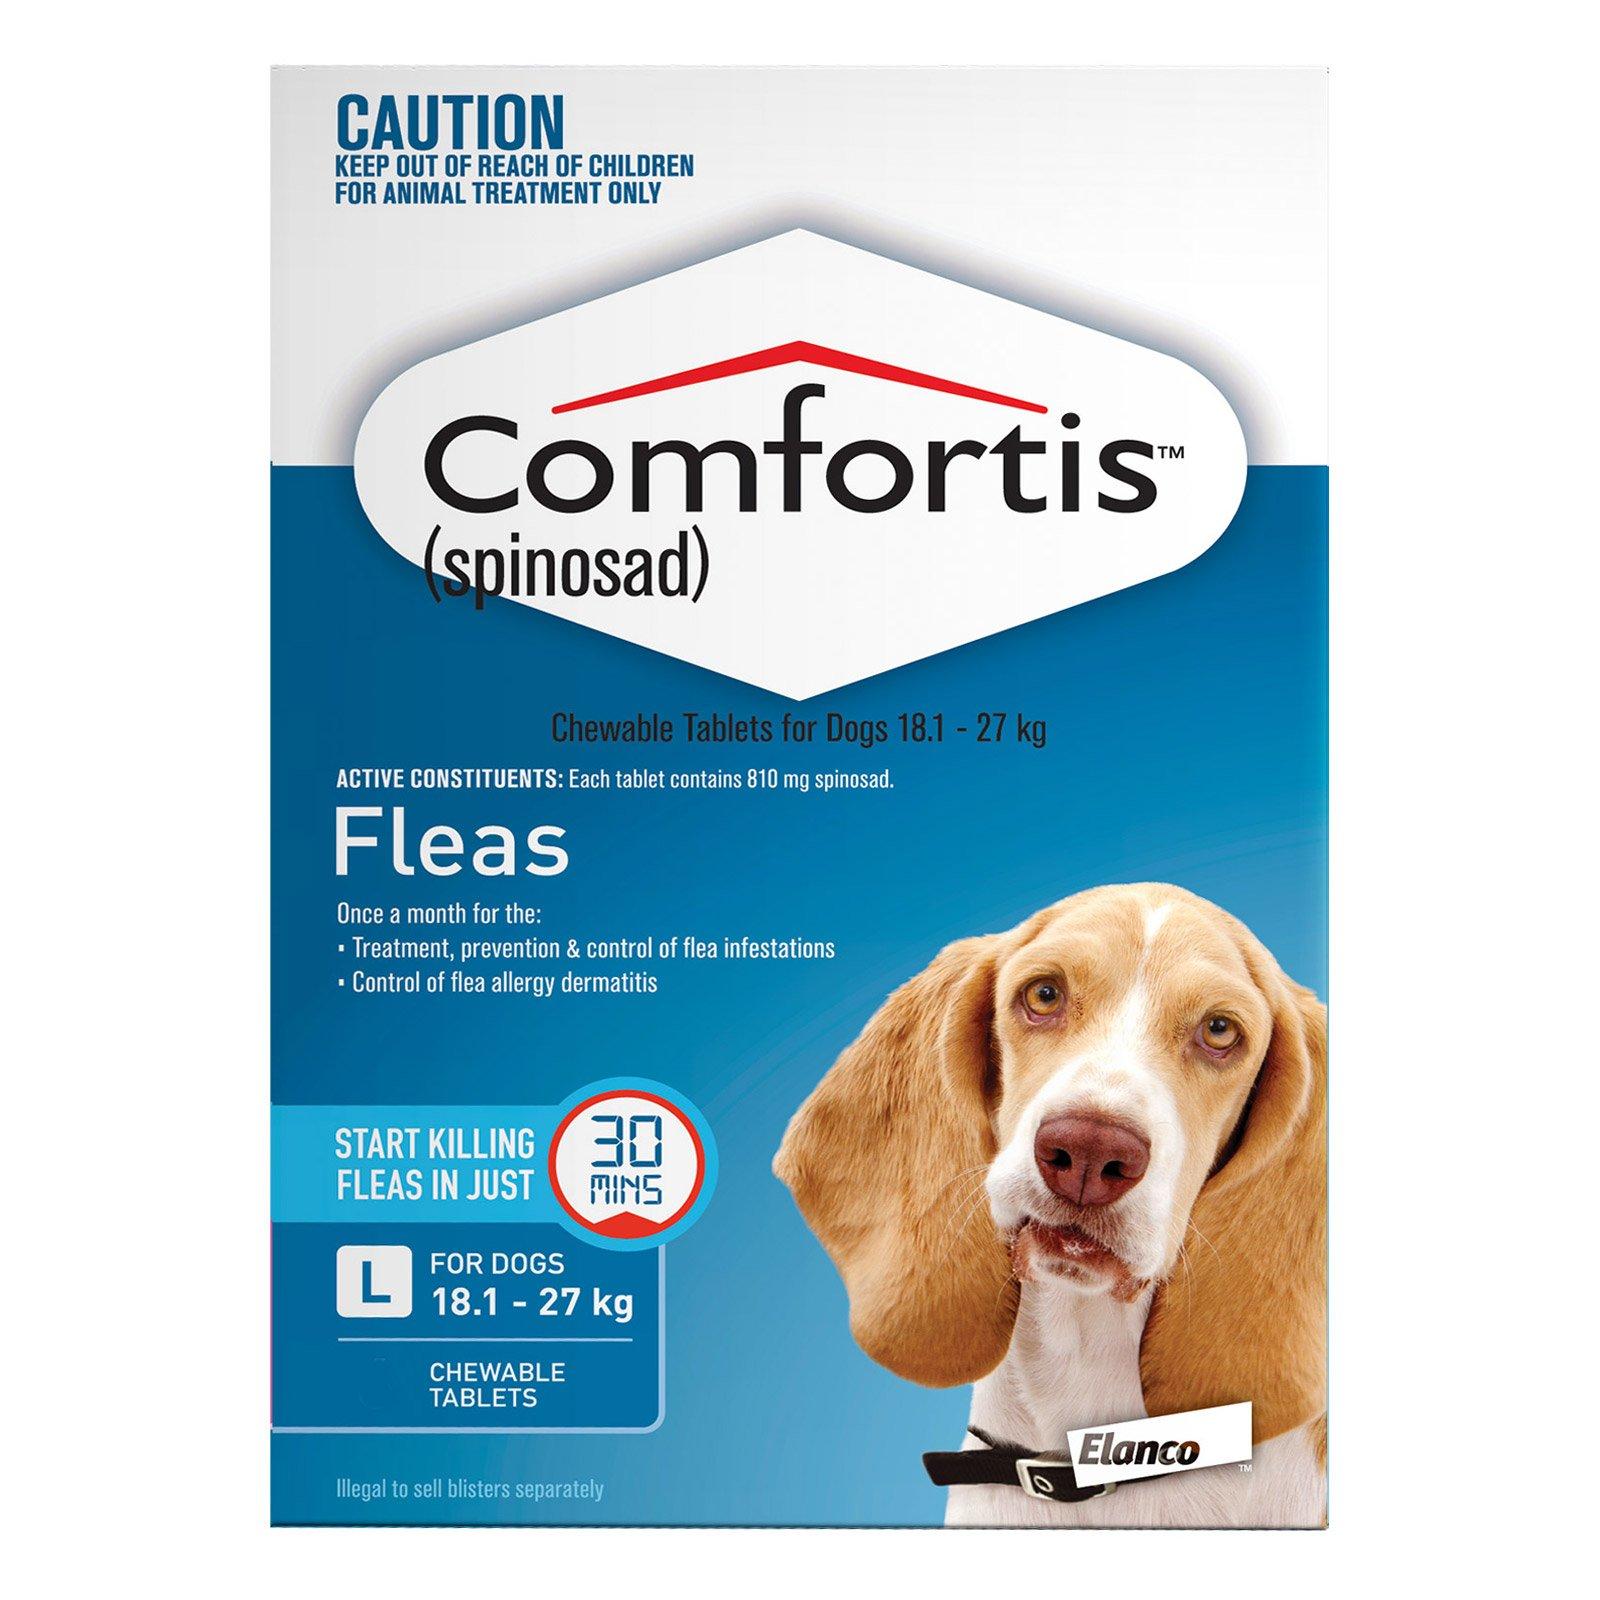 Comfortis For Dogs 18.1 - 27 Kg (Blue)